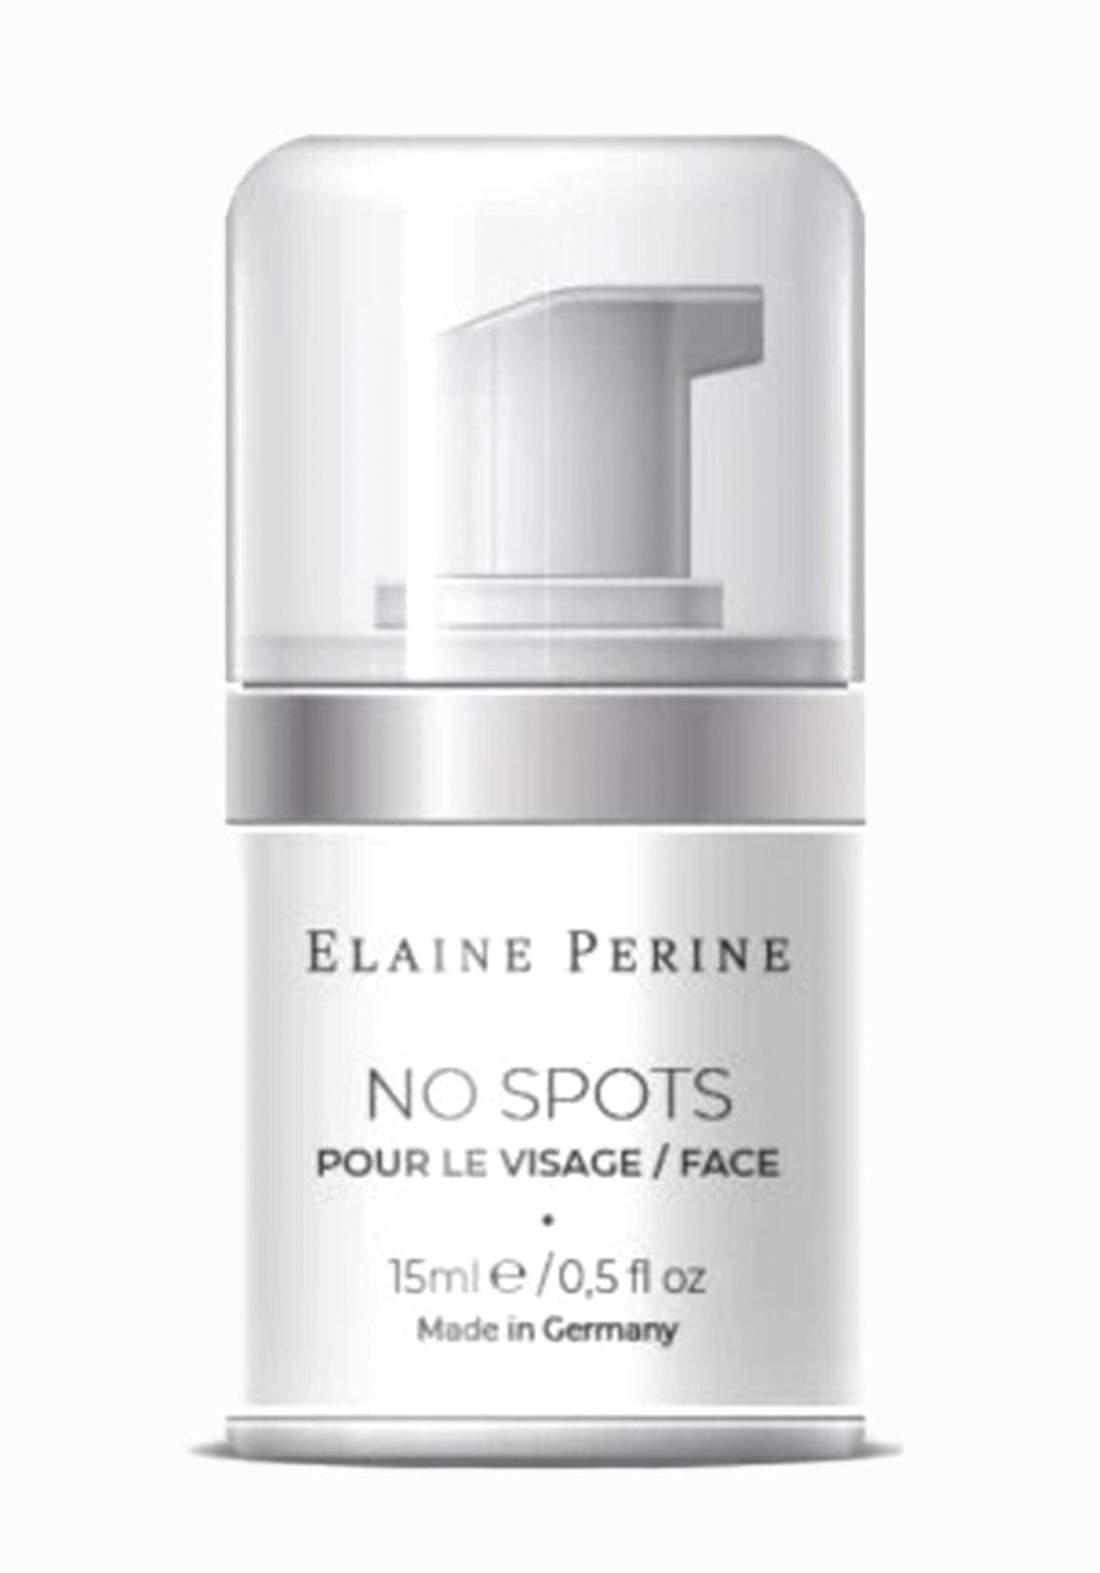 Elaine Perine No Spots 15ml كريم طبي لتوحيد لون البشرة